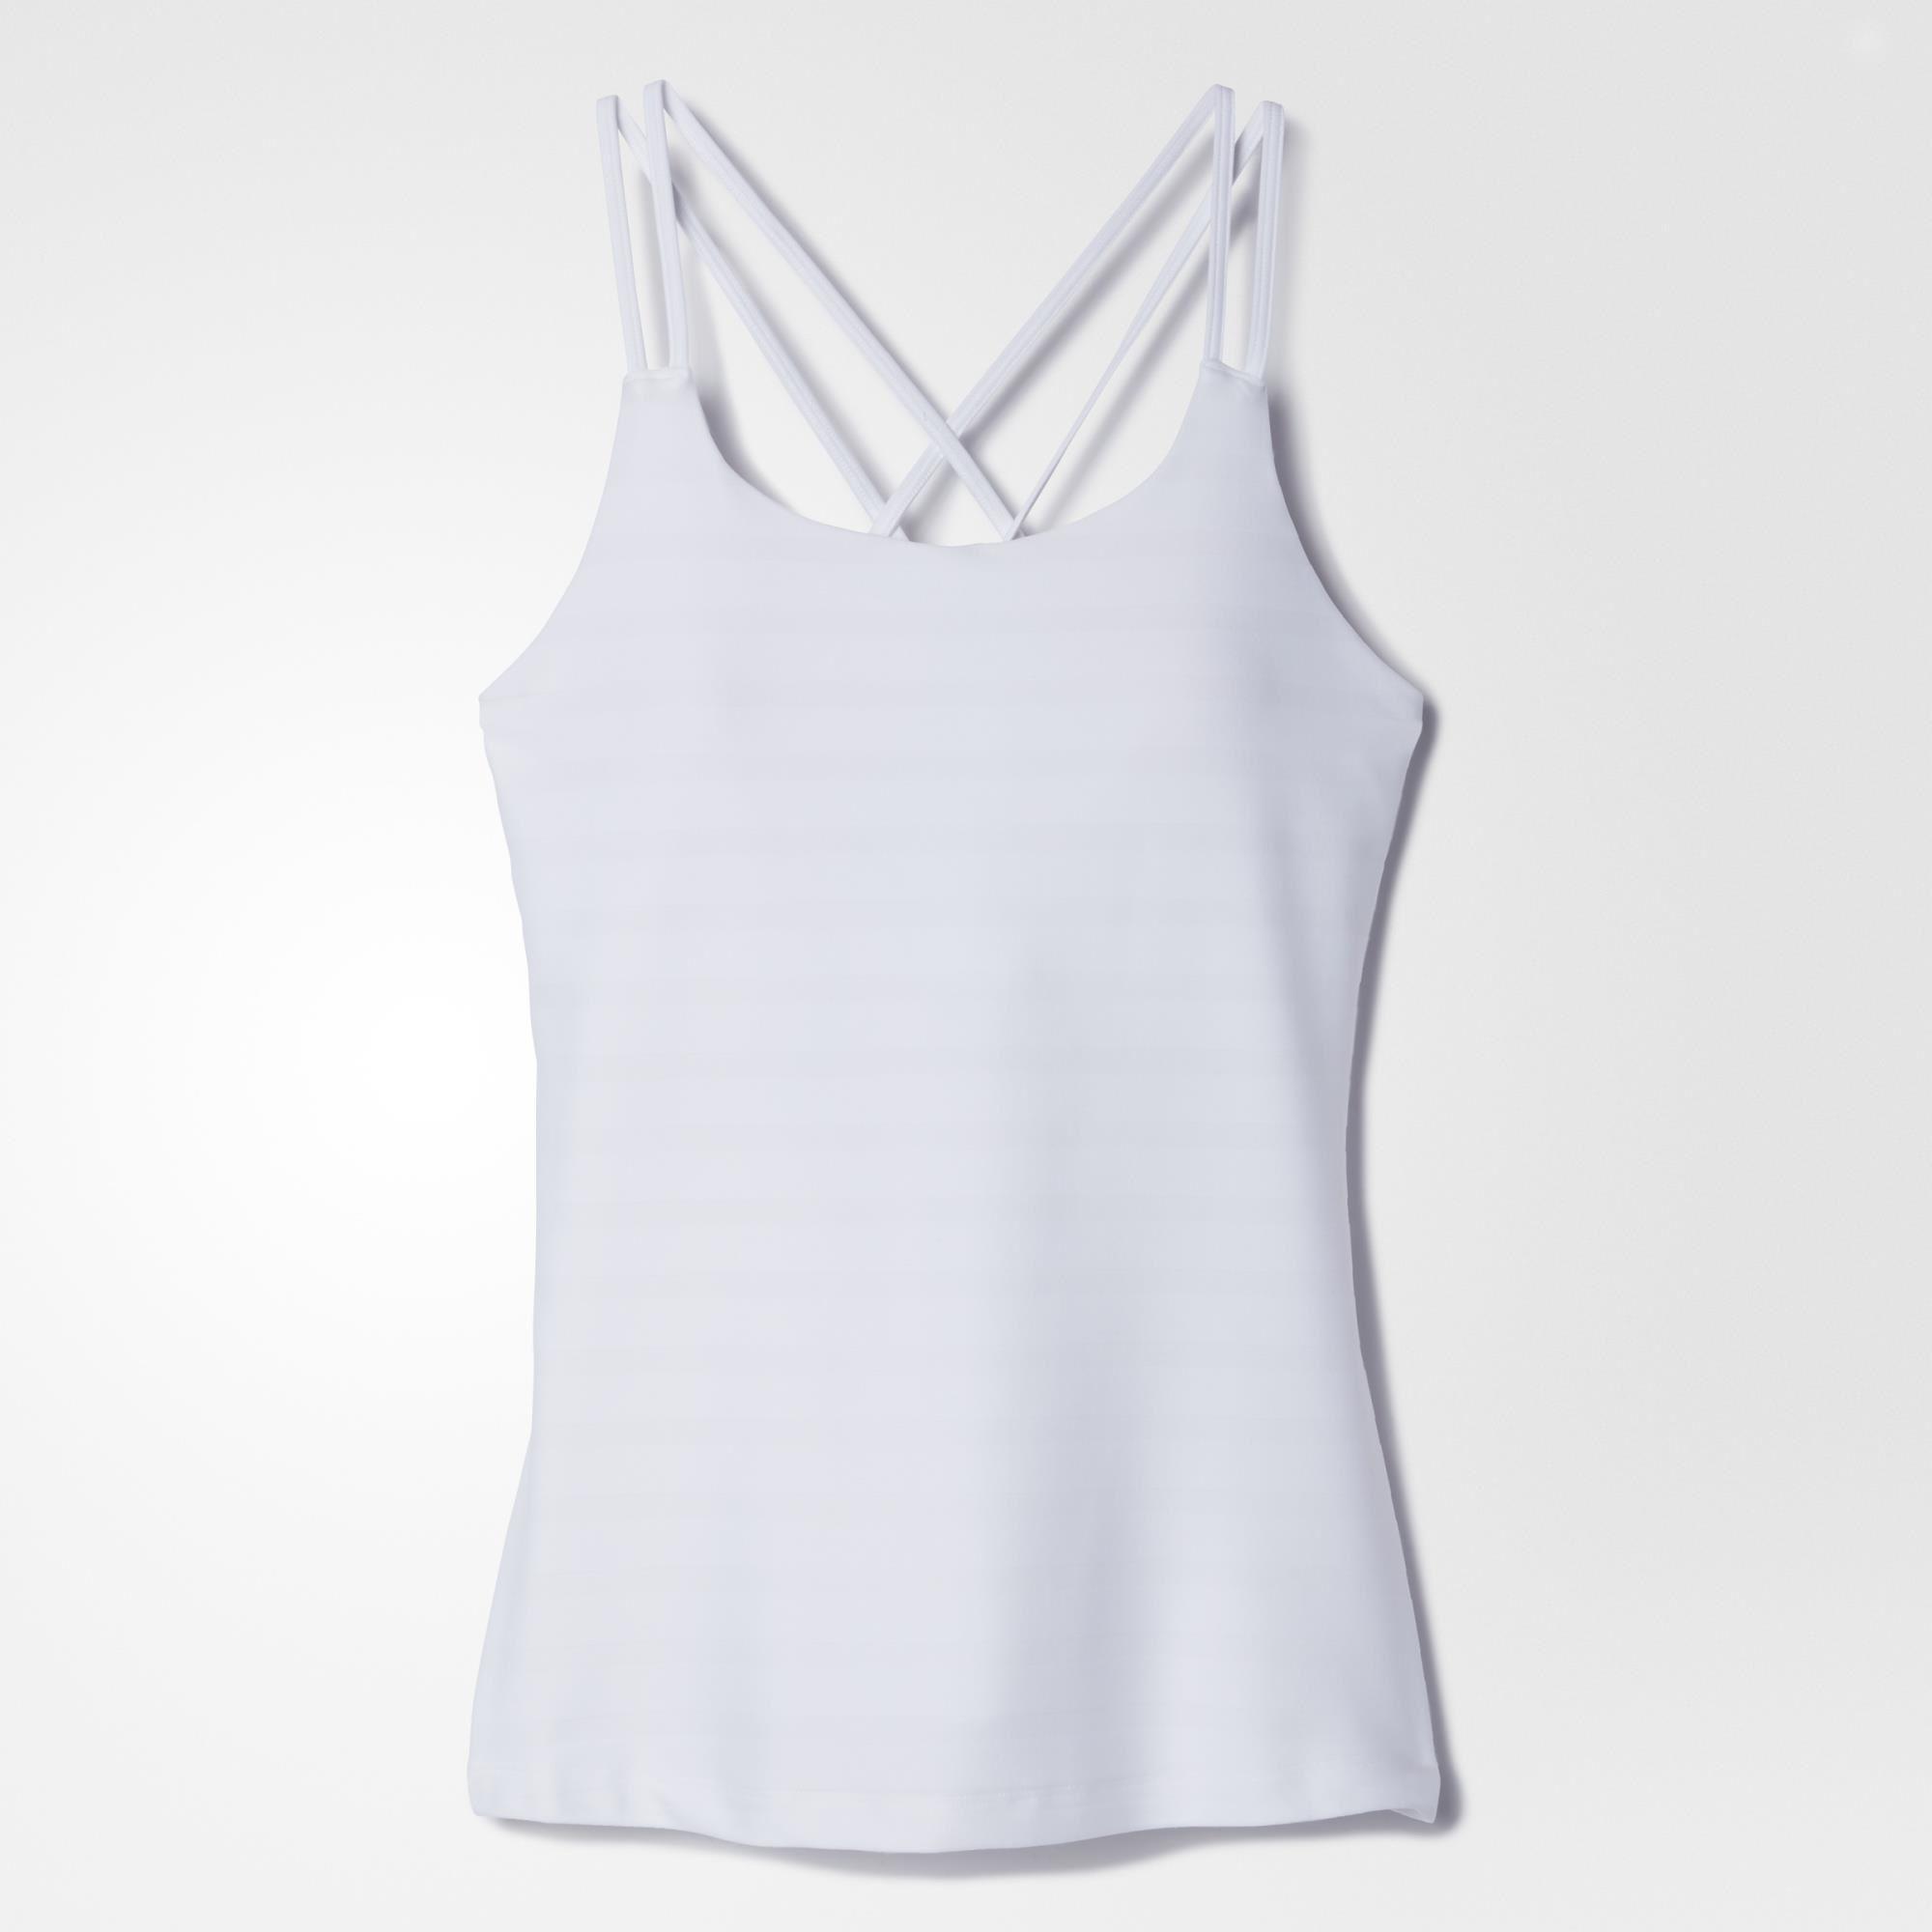 1286ef56bb Adidas Womens All Premium Strappy Tank Top - White - Tennisnuts.com